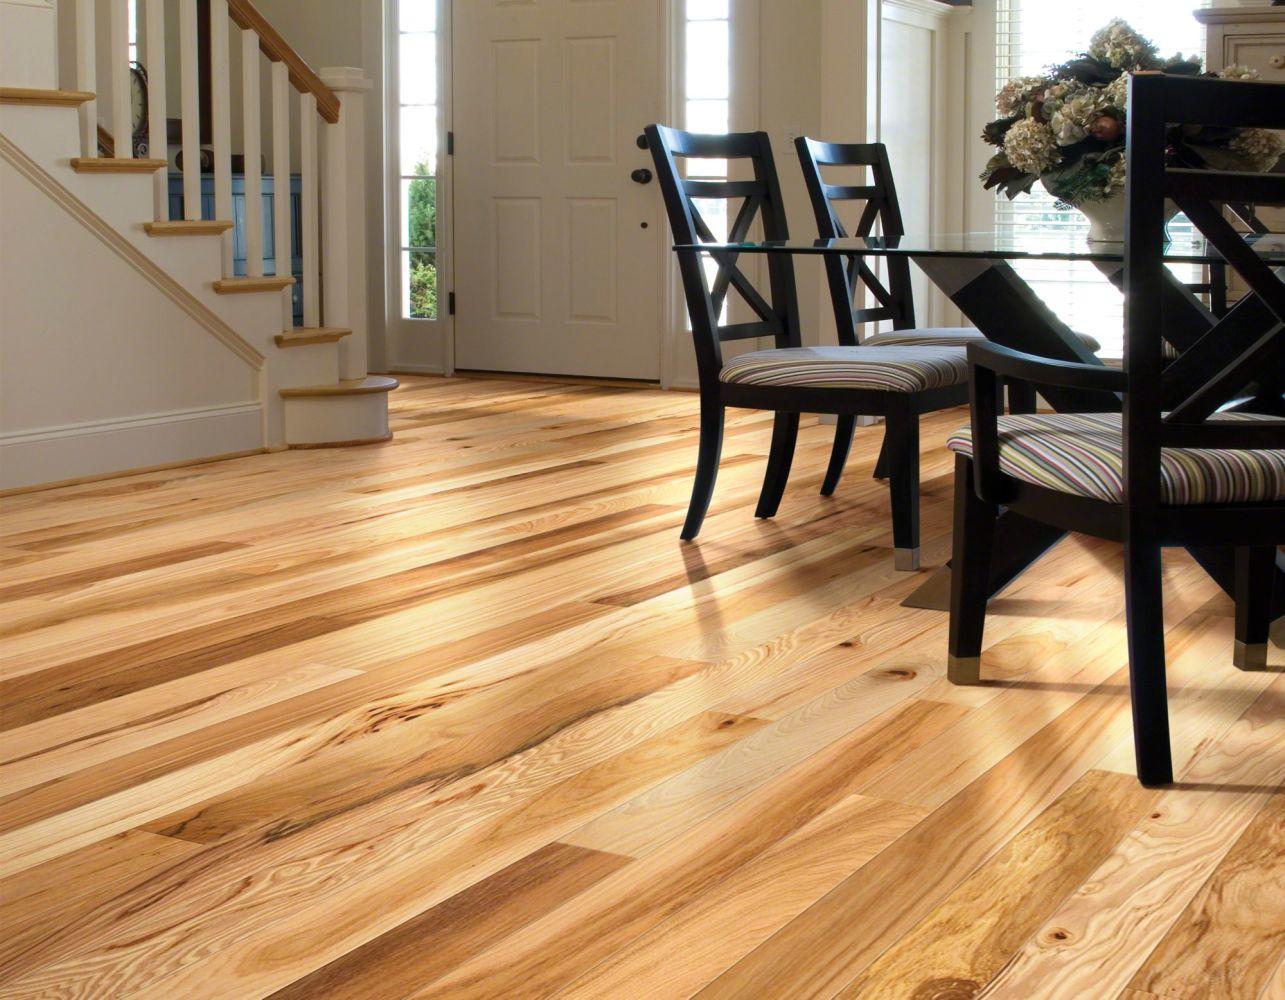 Shaw Floors Home Fn Gold Hardwood Lucky Streak 3.25 Rustic Natural Hickory 00258_HW478